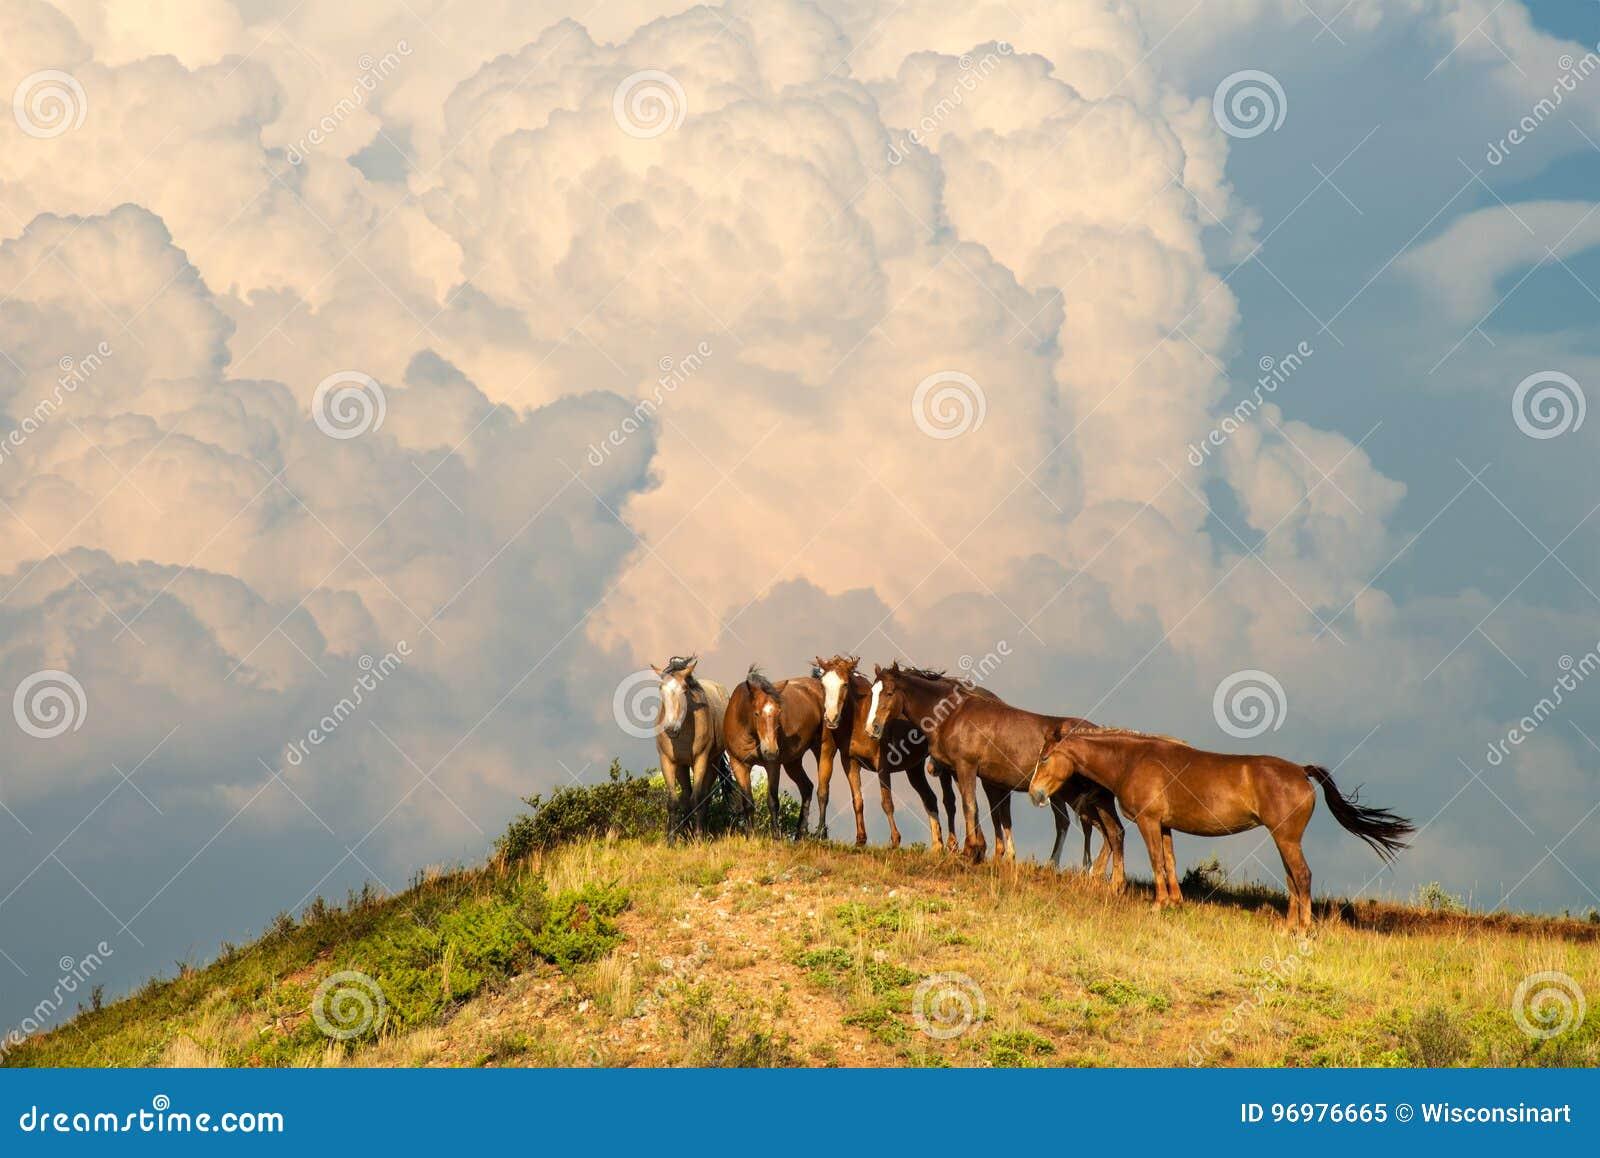 Wild paardkudde, Paarden, Onweerswolk